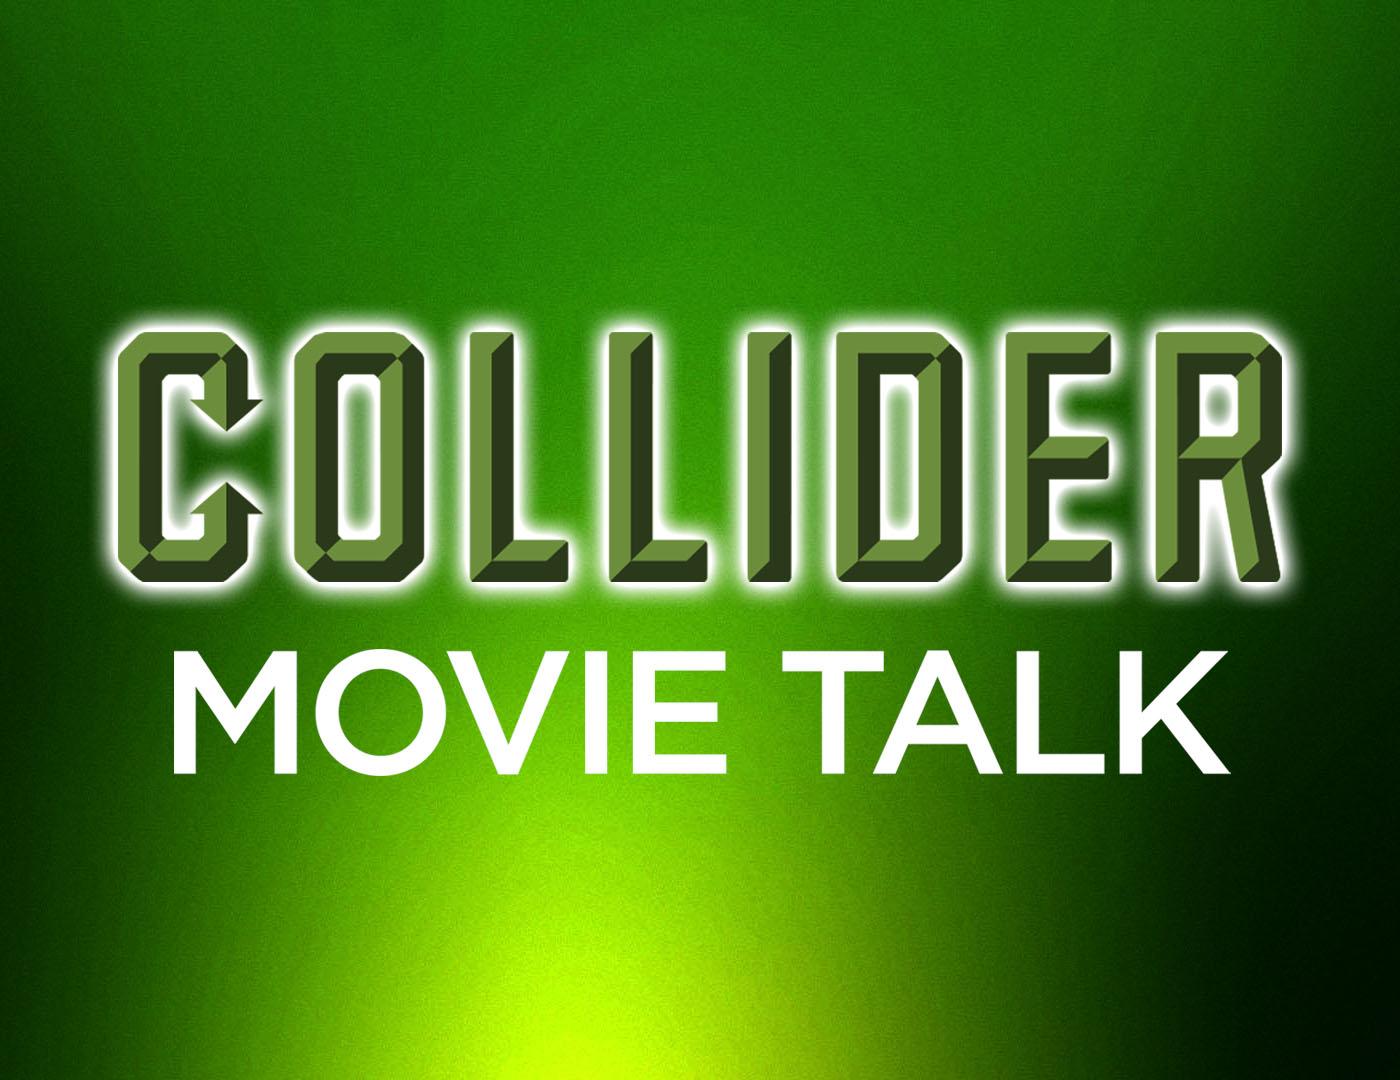 New Assassin's Creed Trailer Drops - Collider Movie Talk